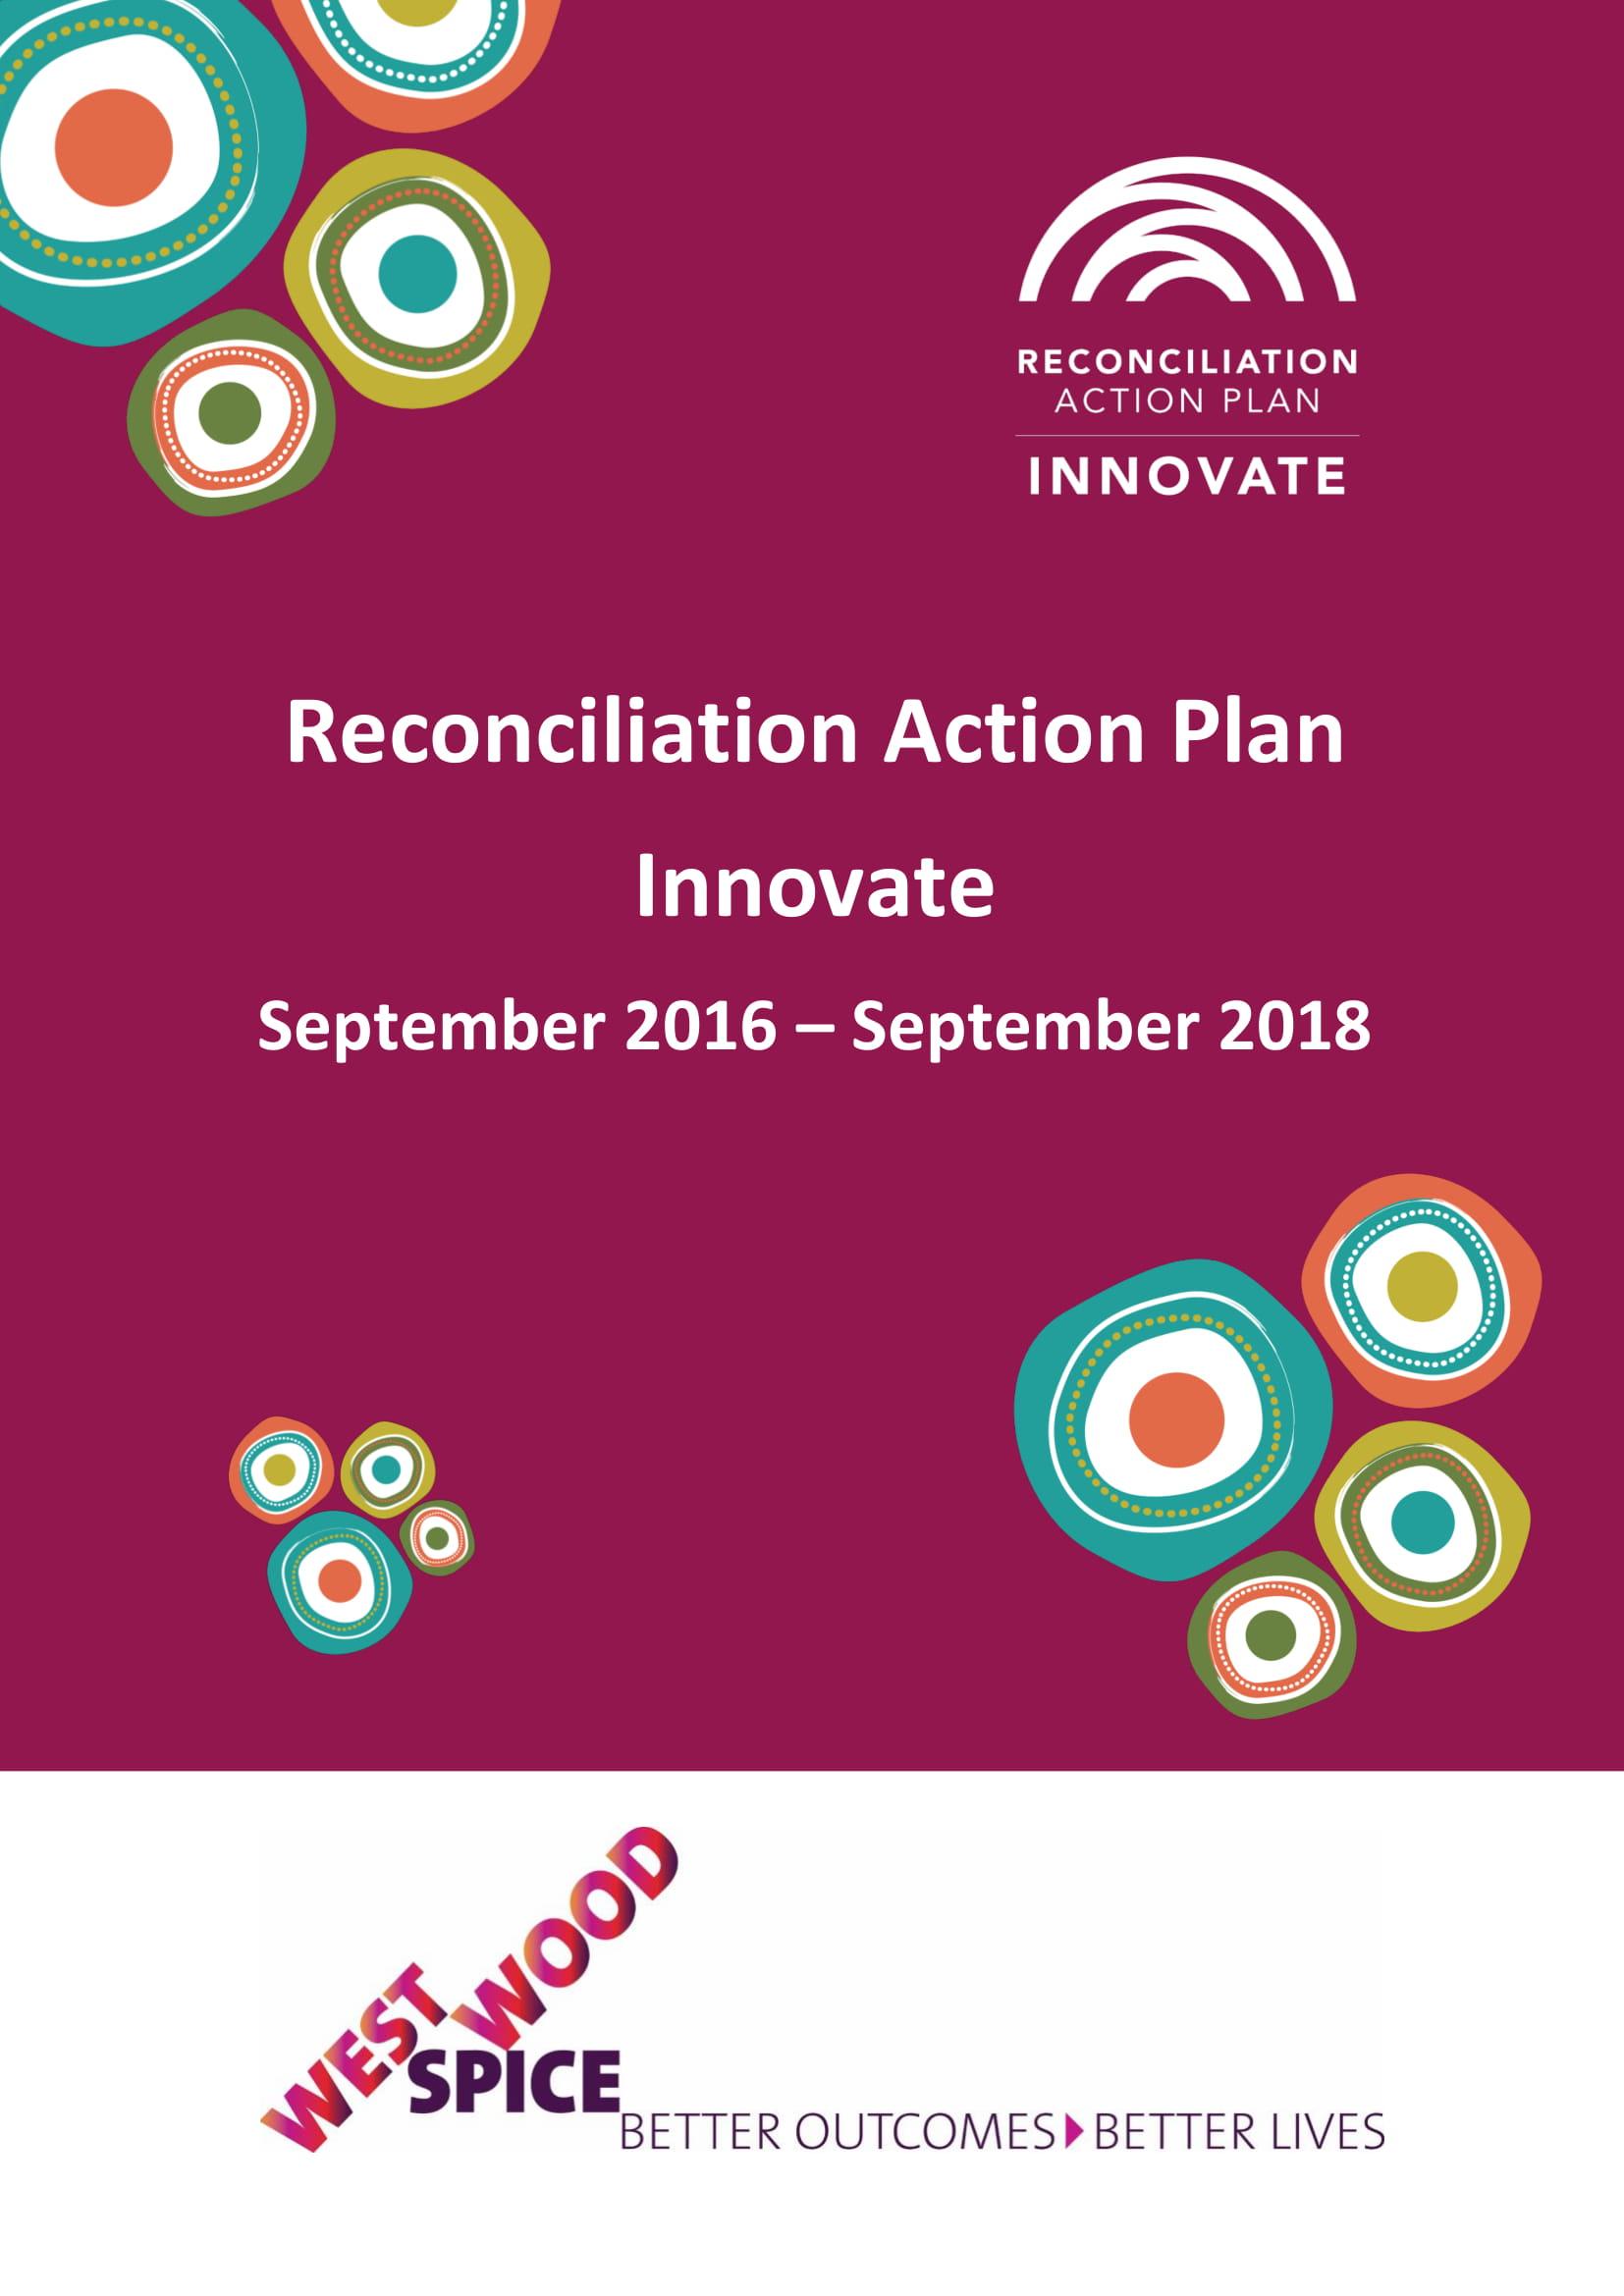 comprehensive reconciliation action plan example 01